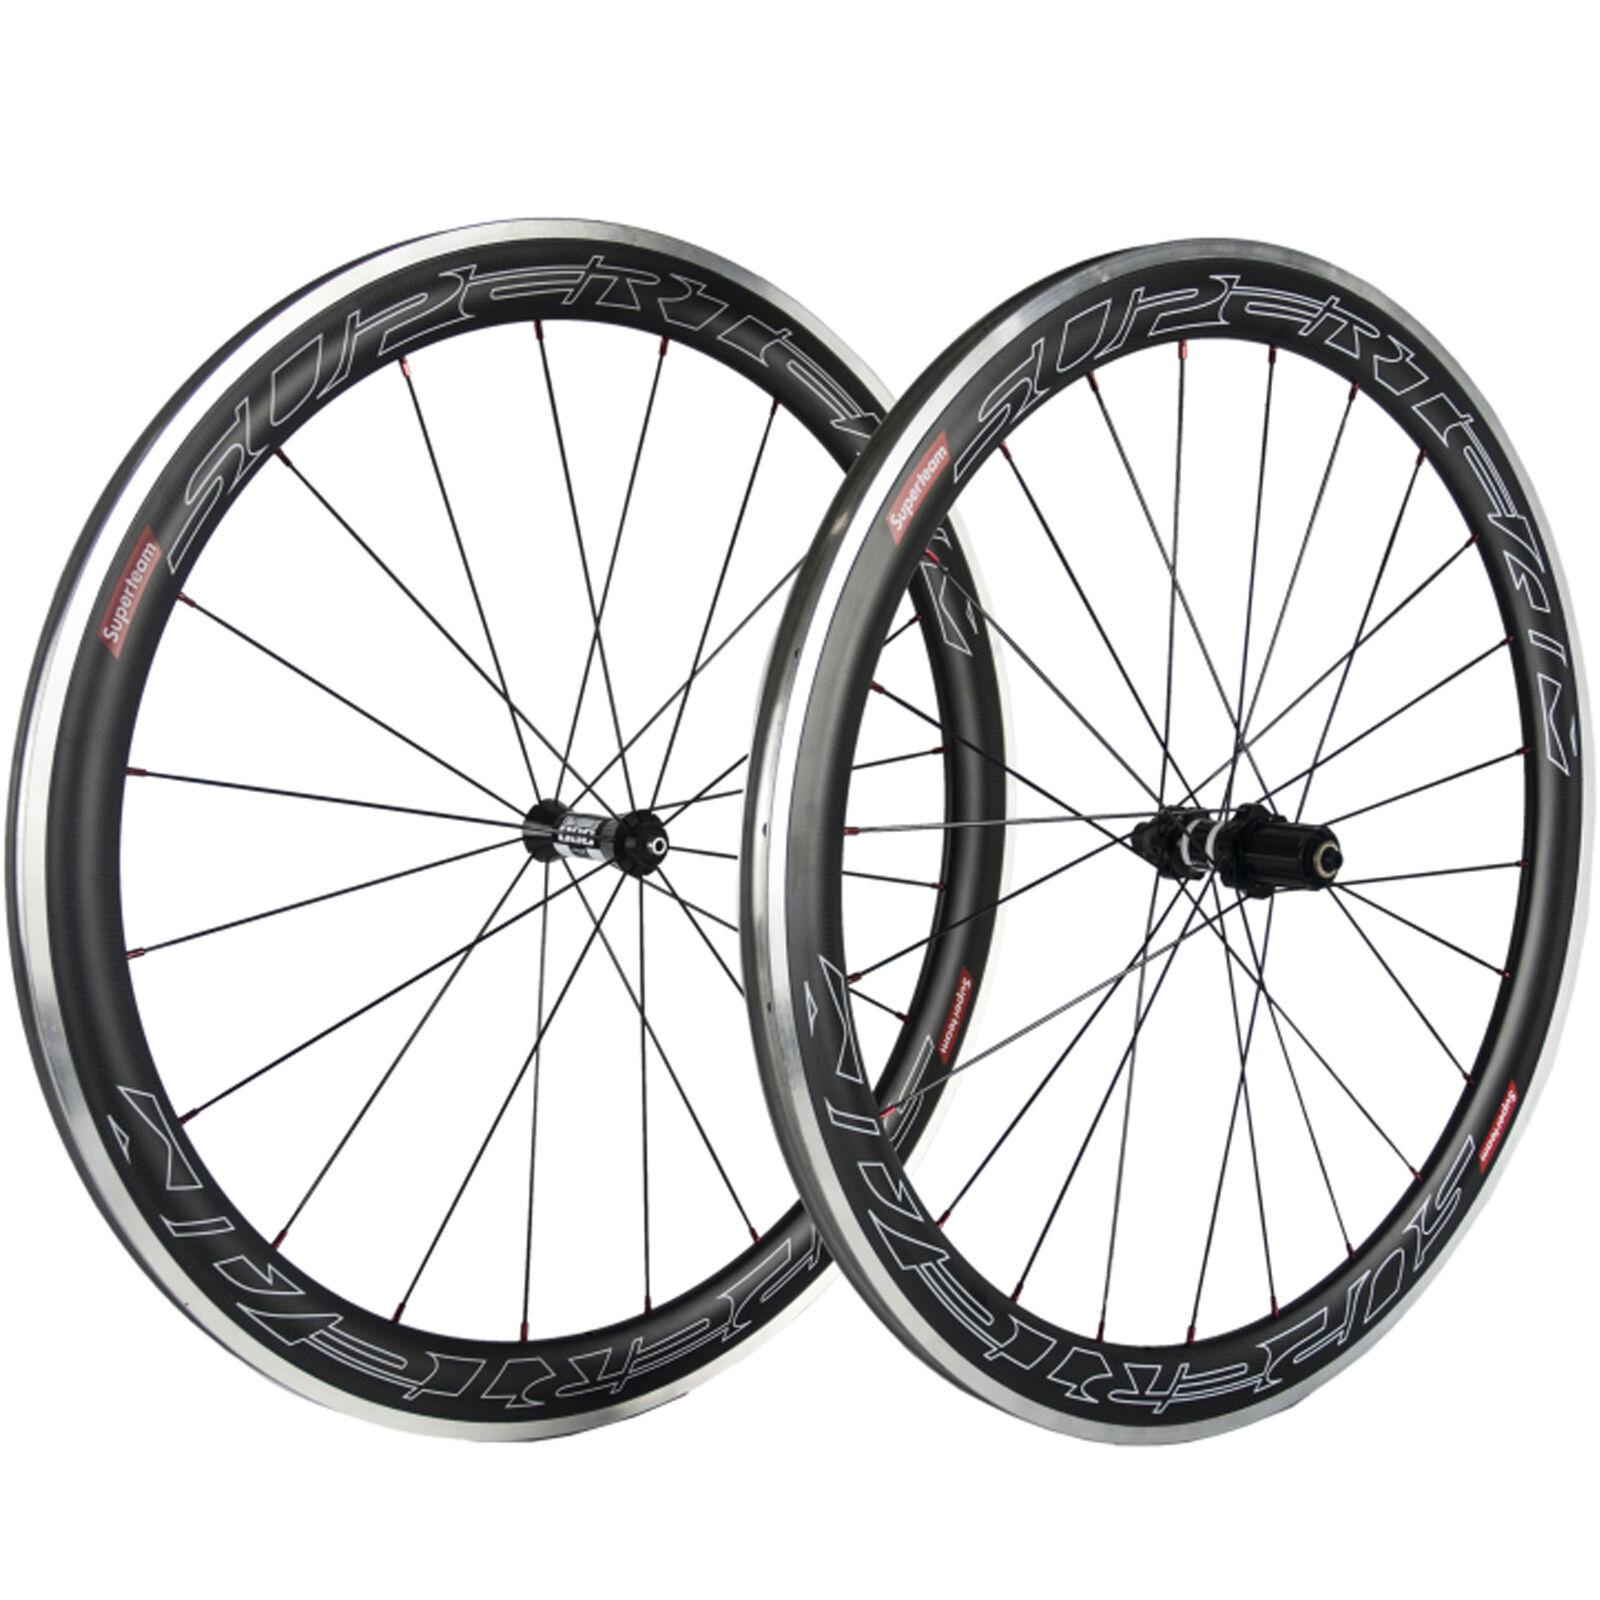 SUPERTEAM 50mm Carbon  Clincher Wheelset Alloy Brake Line DT350 Road Bike Wheels  store online